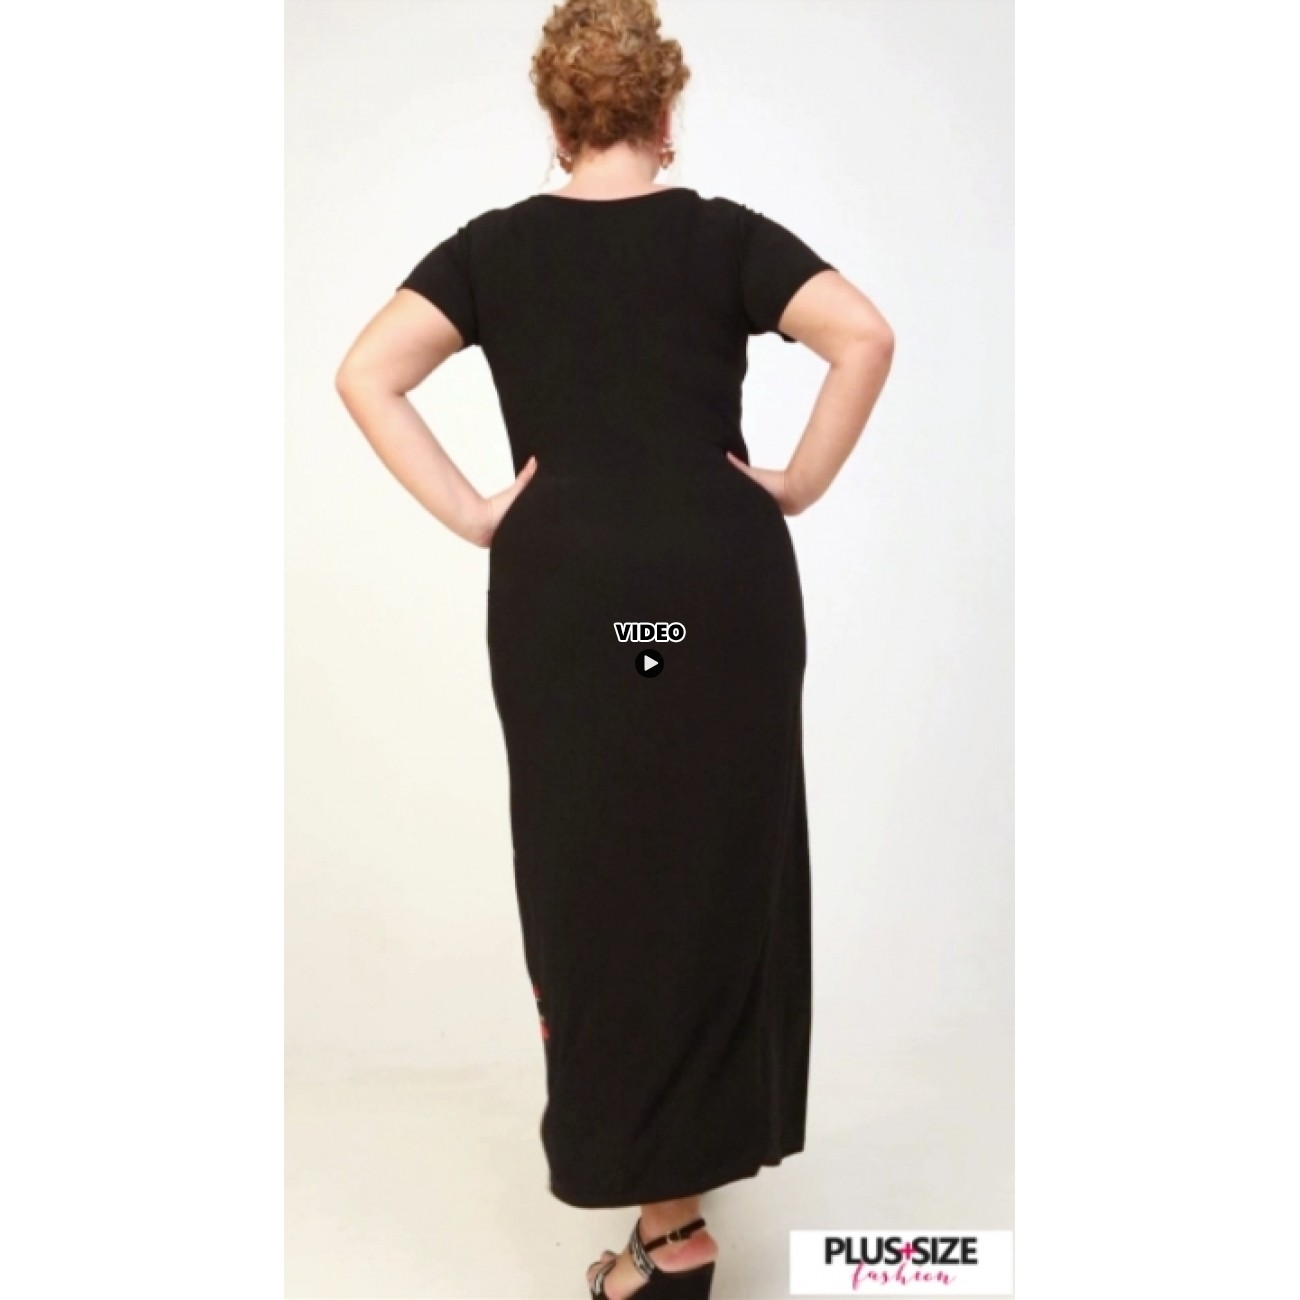 A21-7323FK Long Jersey Dress with pattern